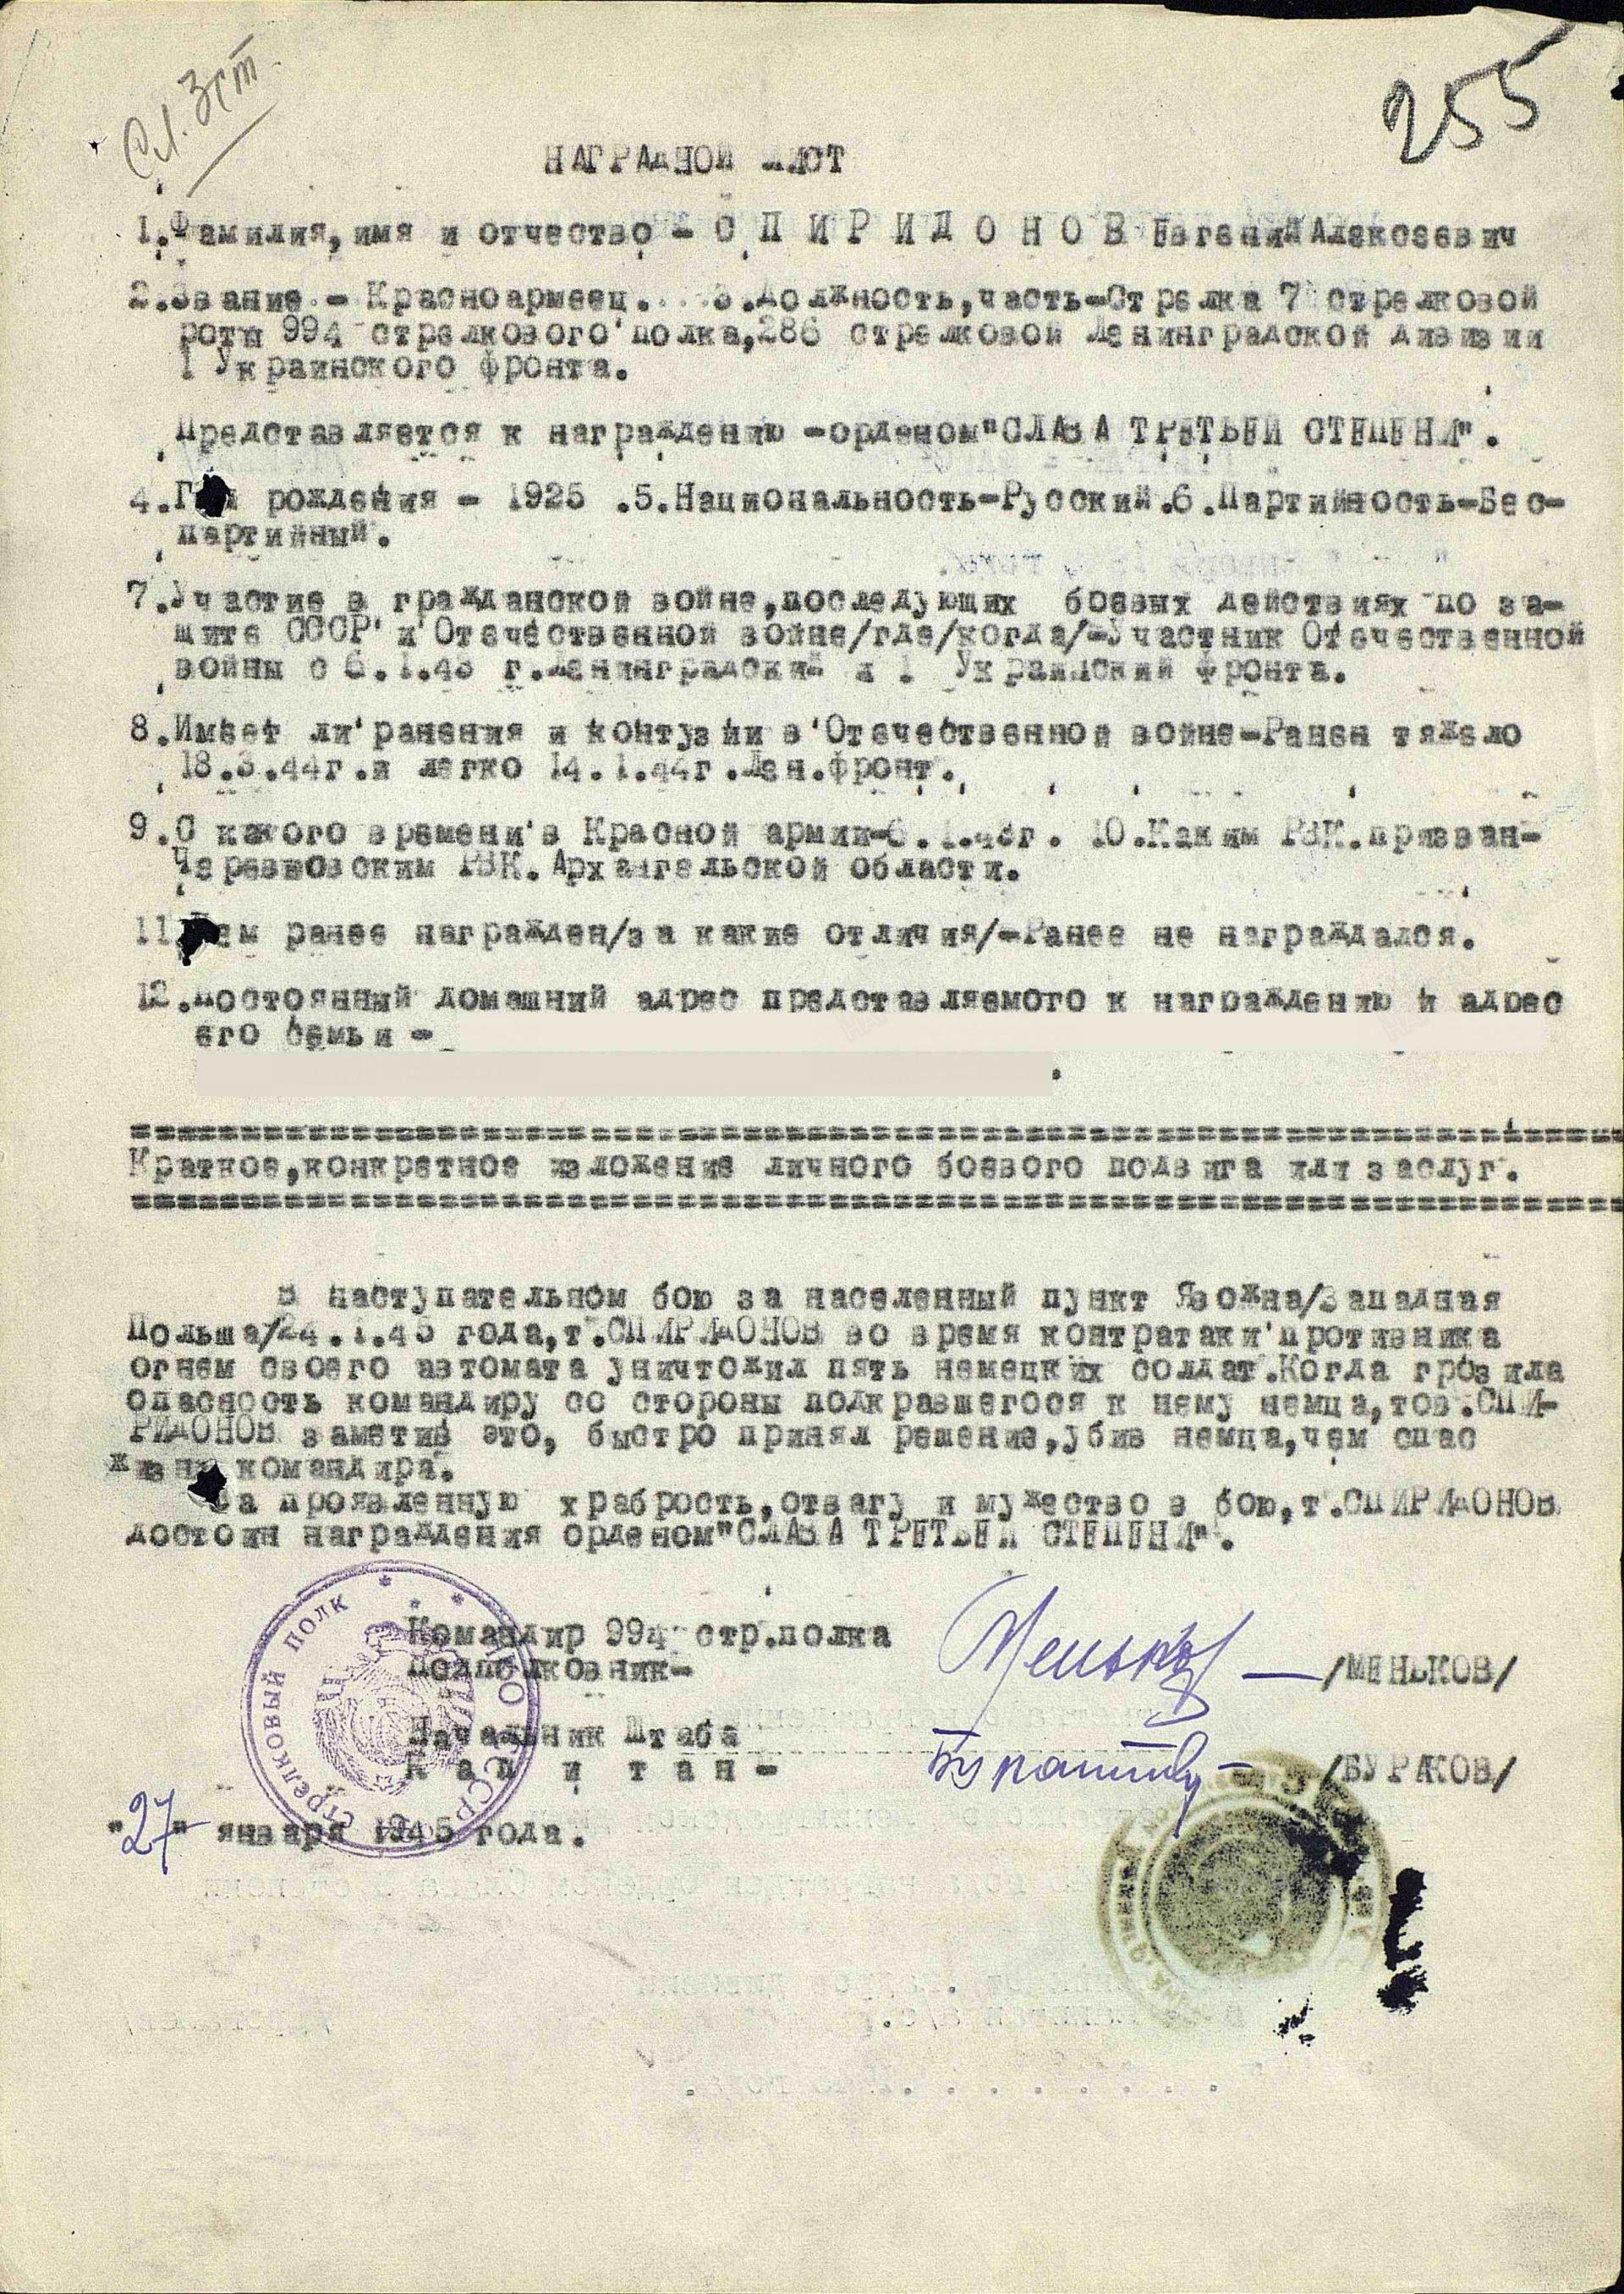 Спиридонов Евгений Алексеевич